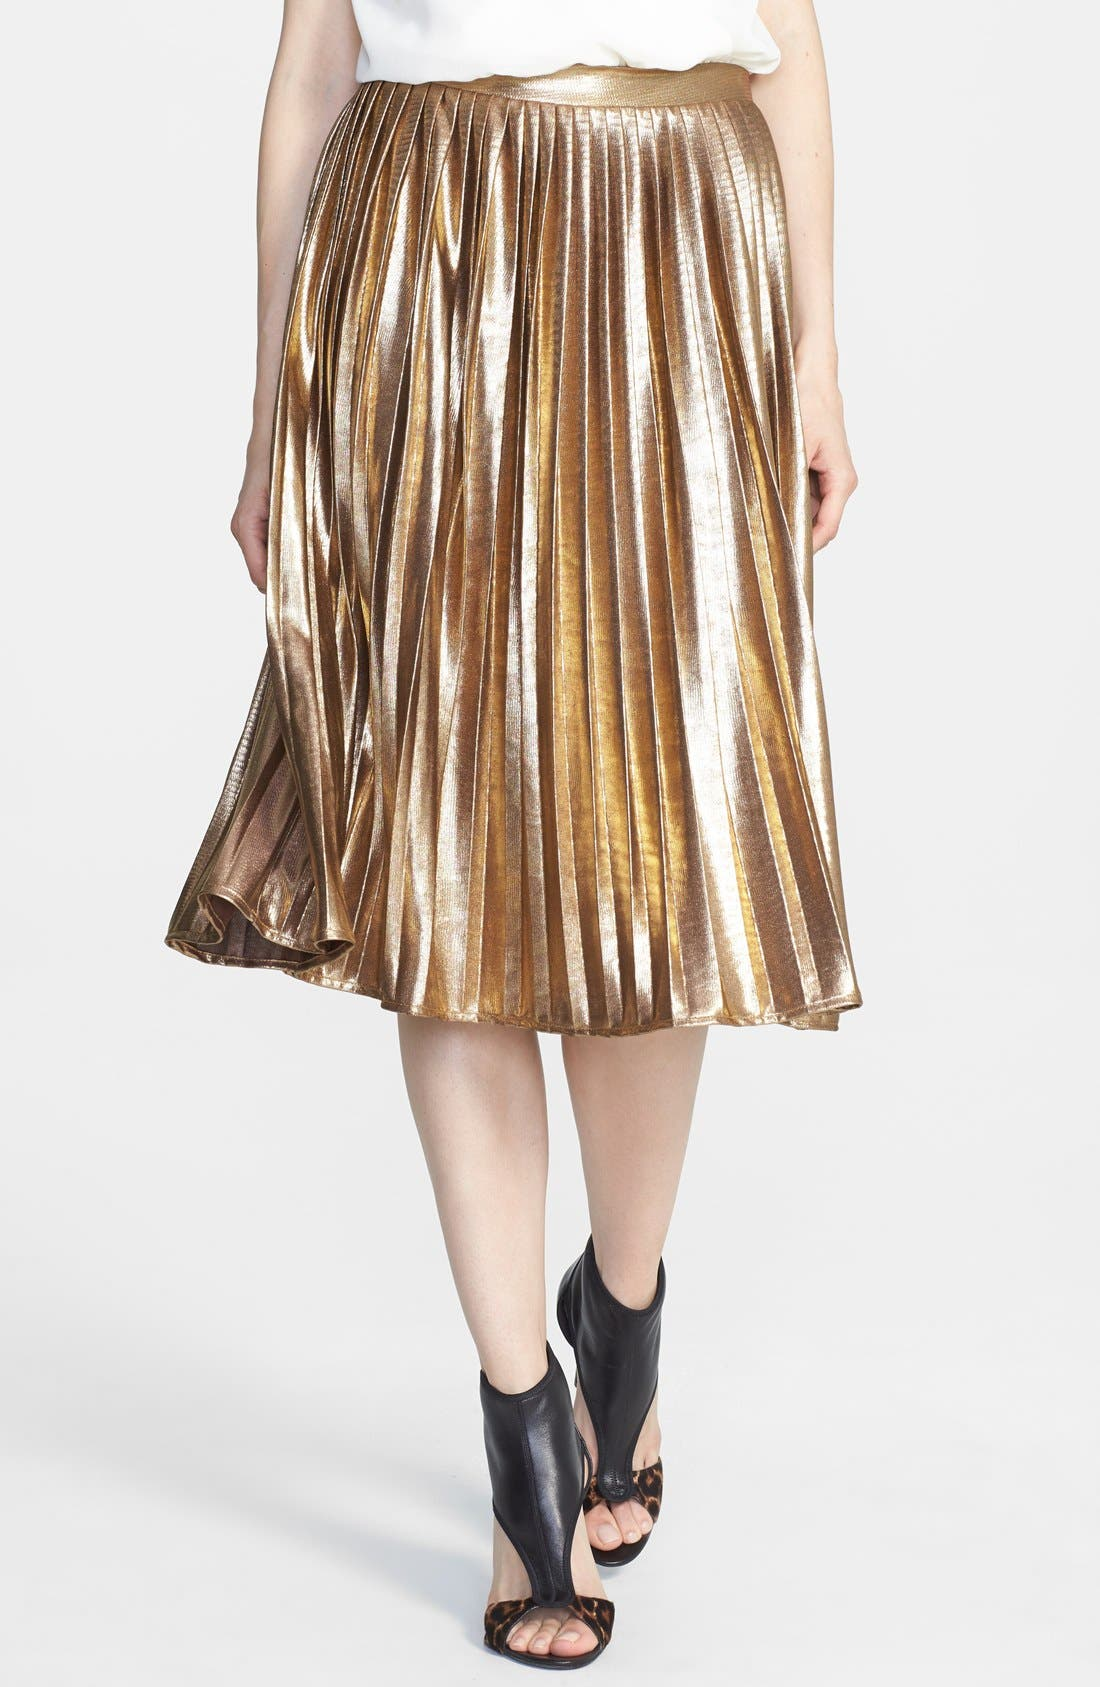 Alternate Image 1 Selected - Rules of Etiquette Metallic Pleat Skirt